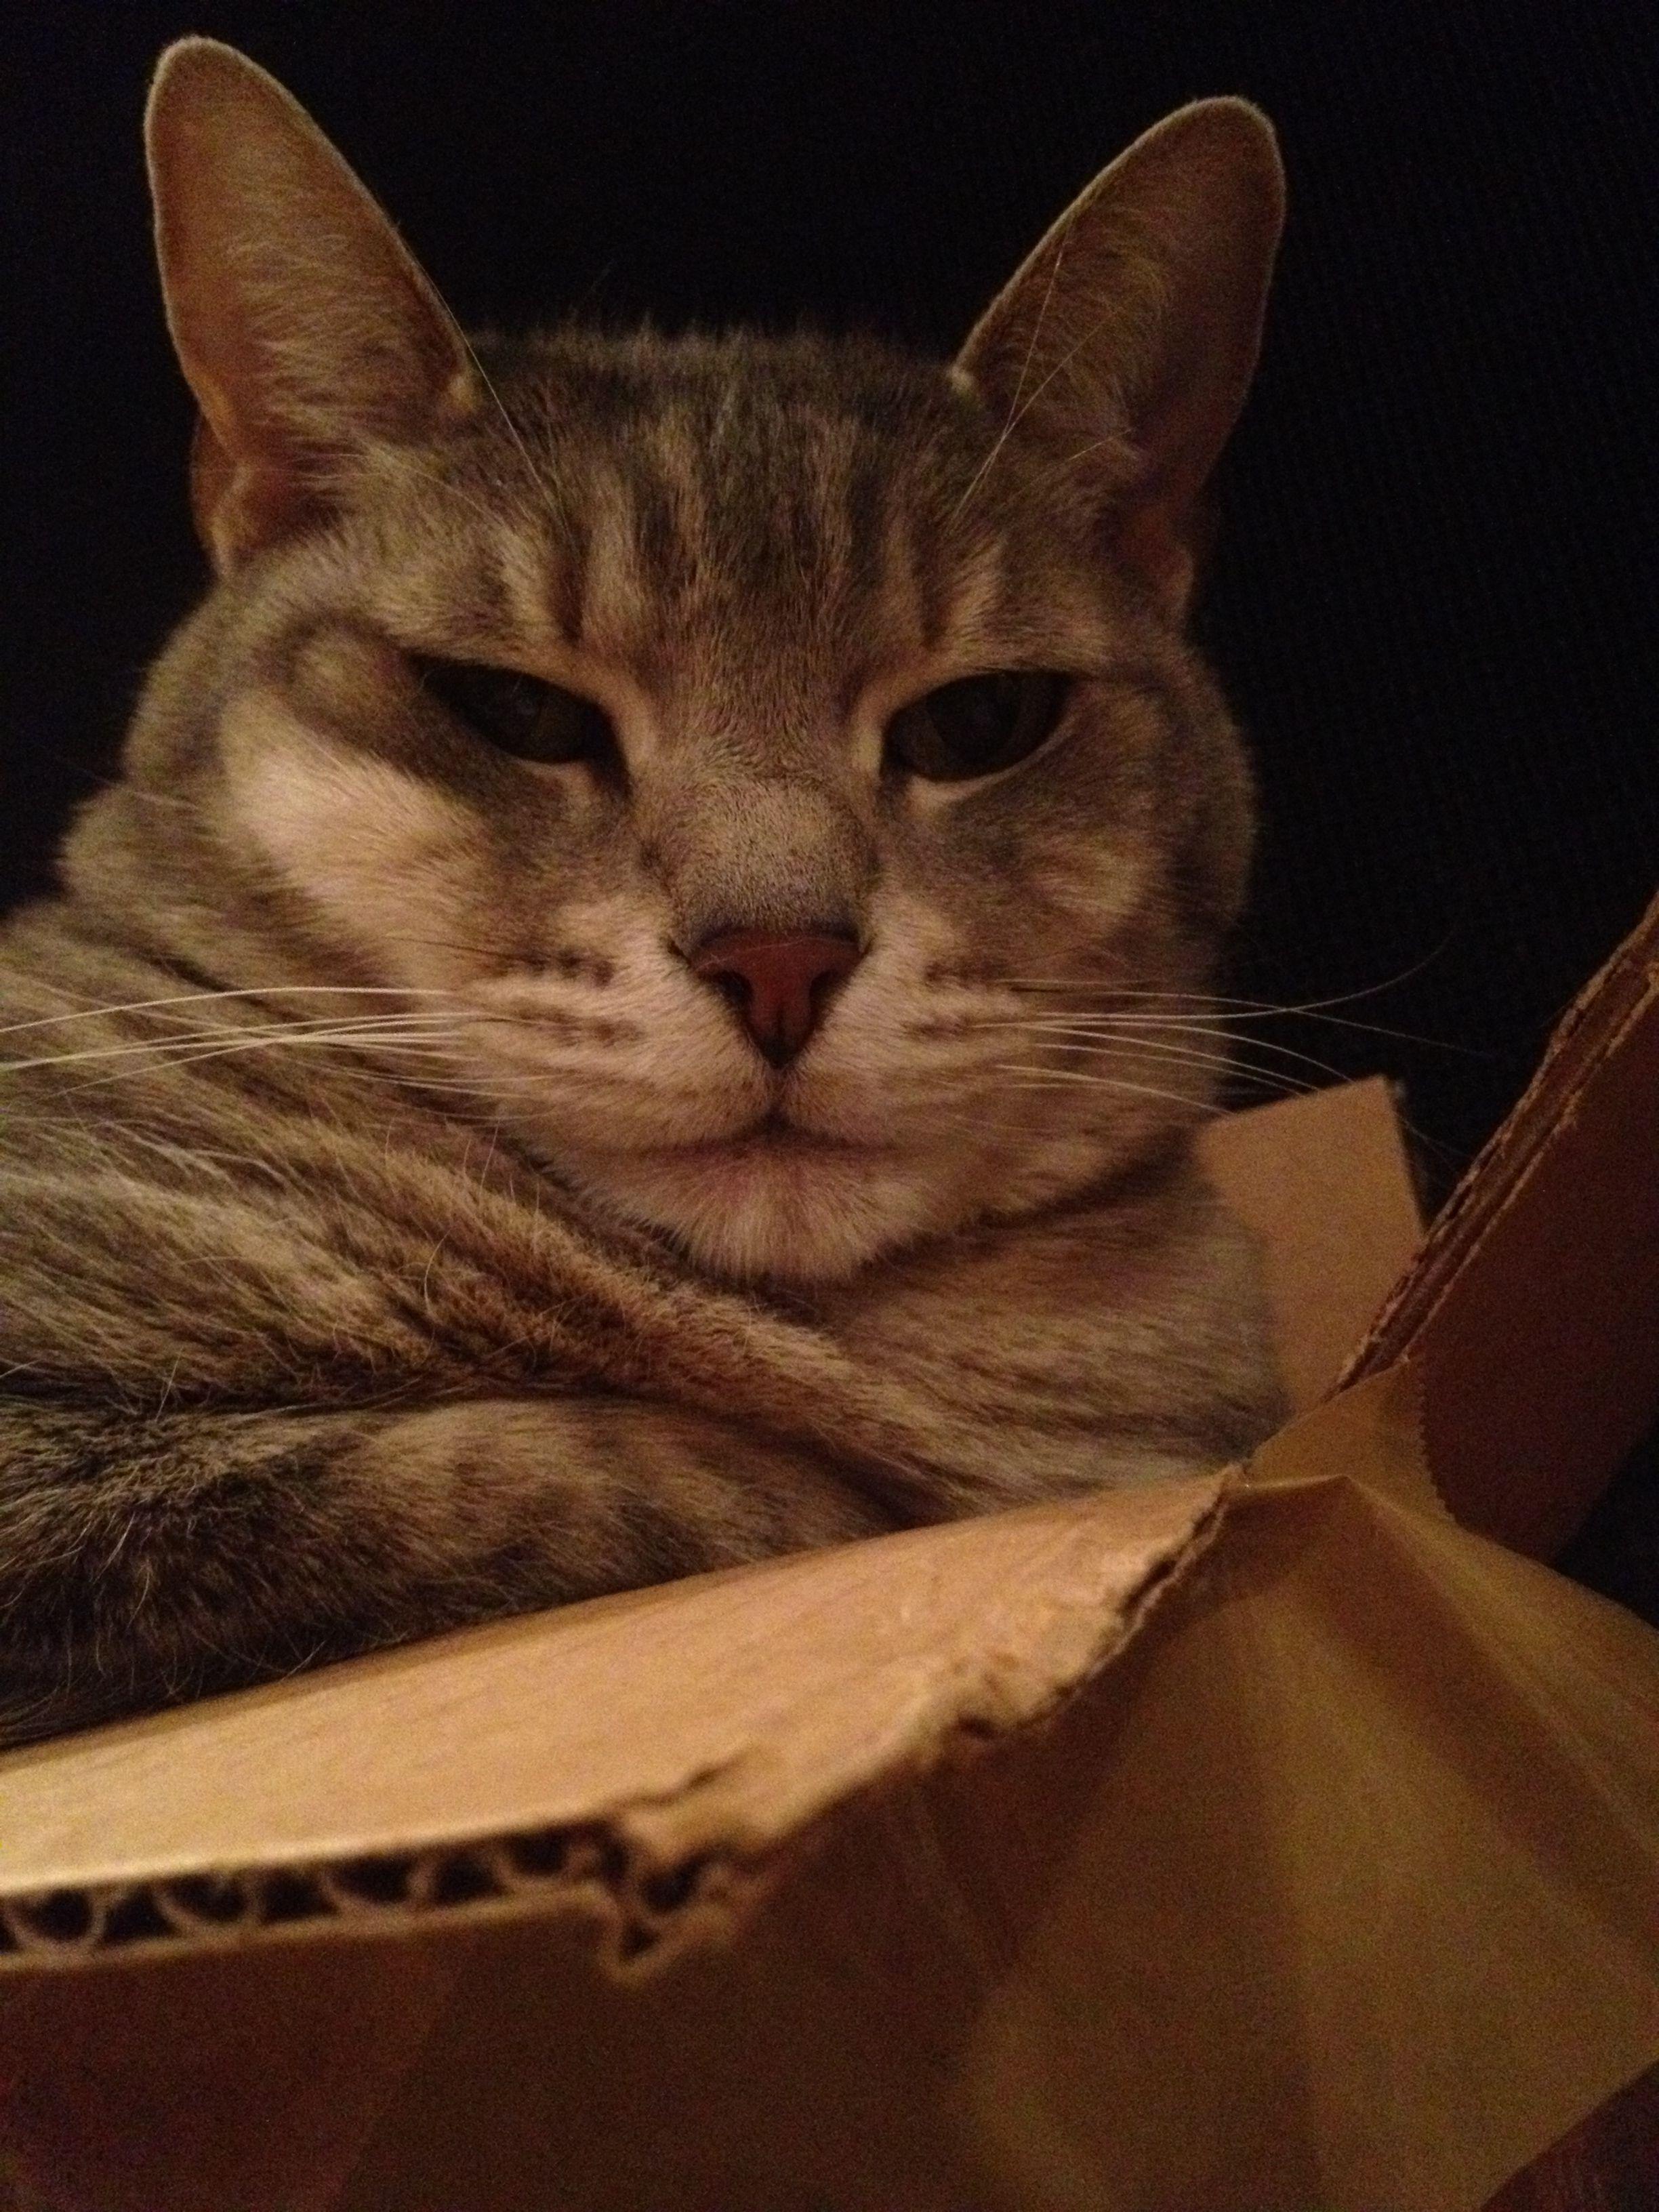 Soft serve cat.